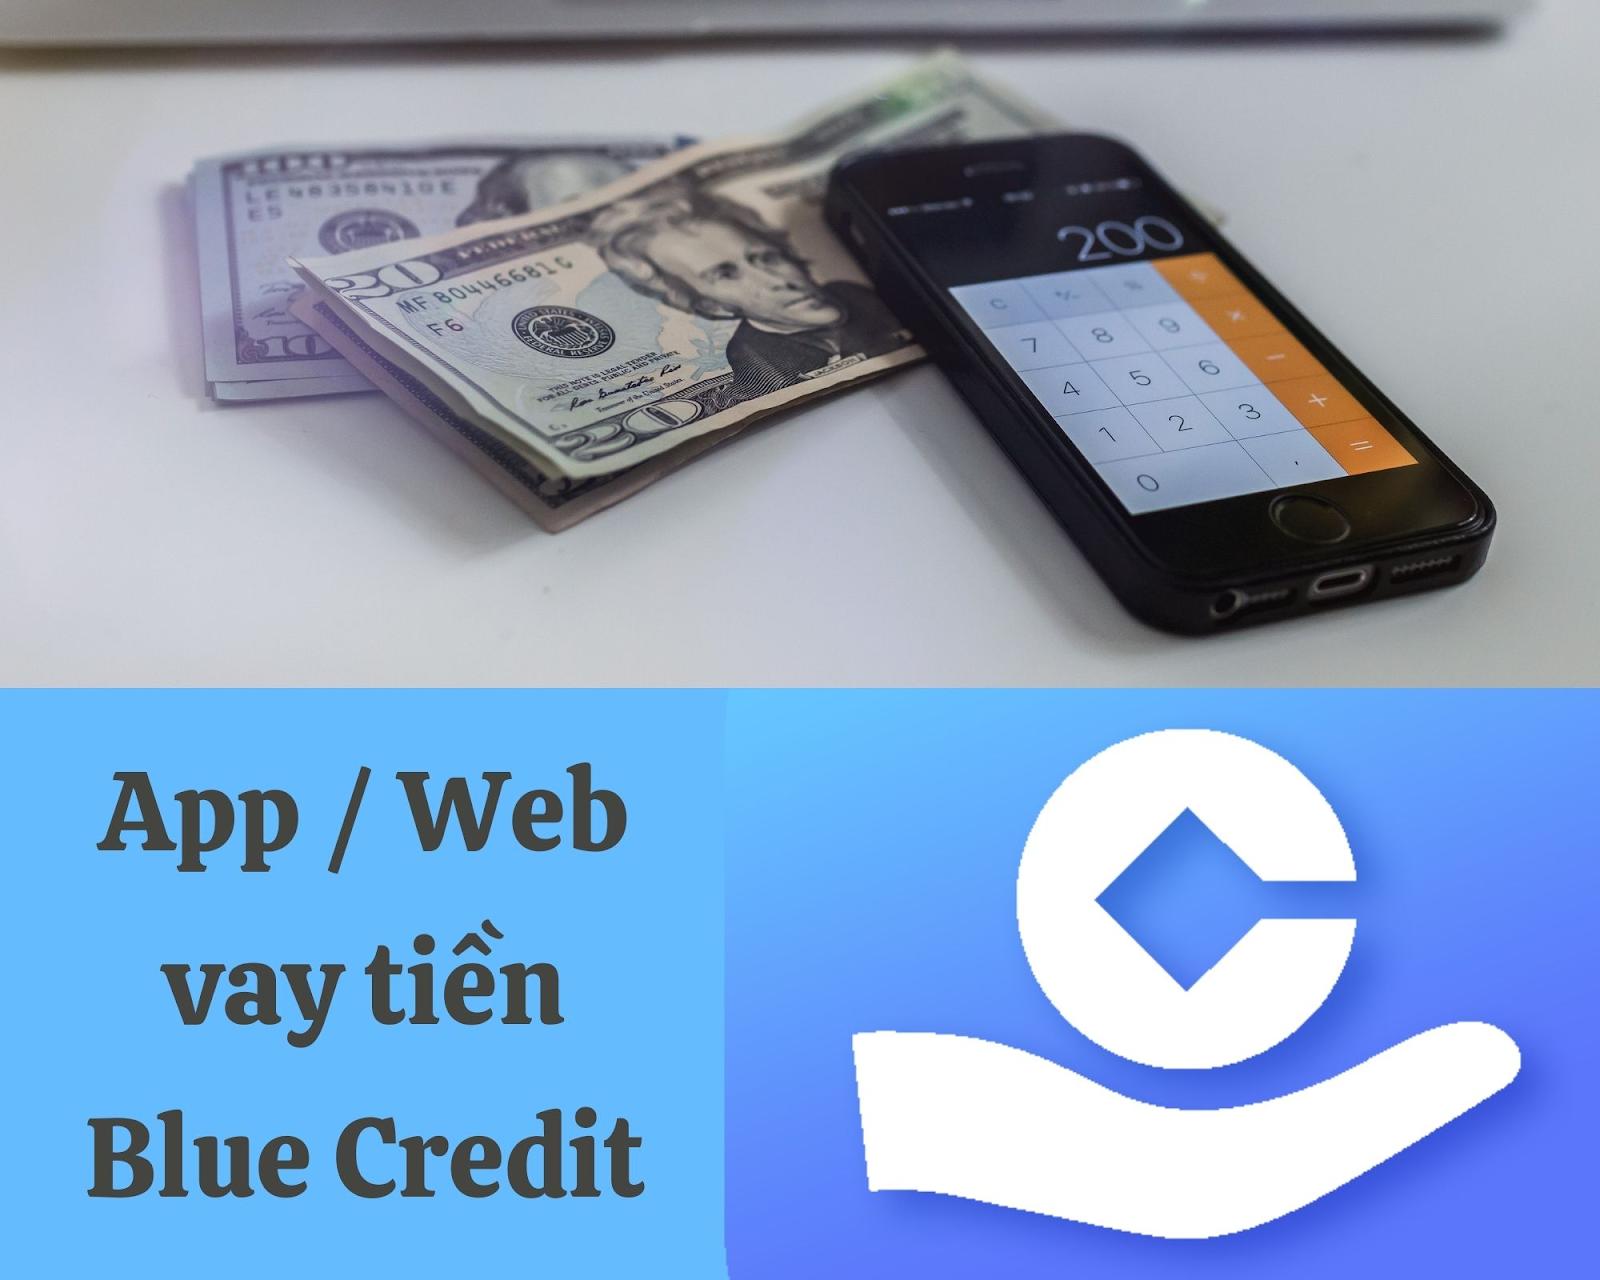 blue credit